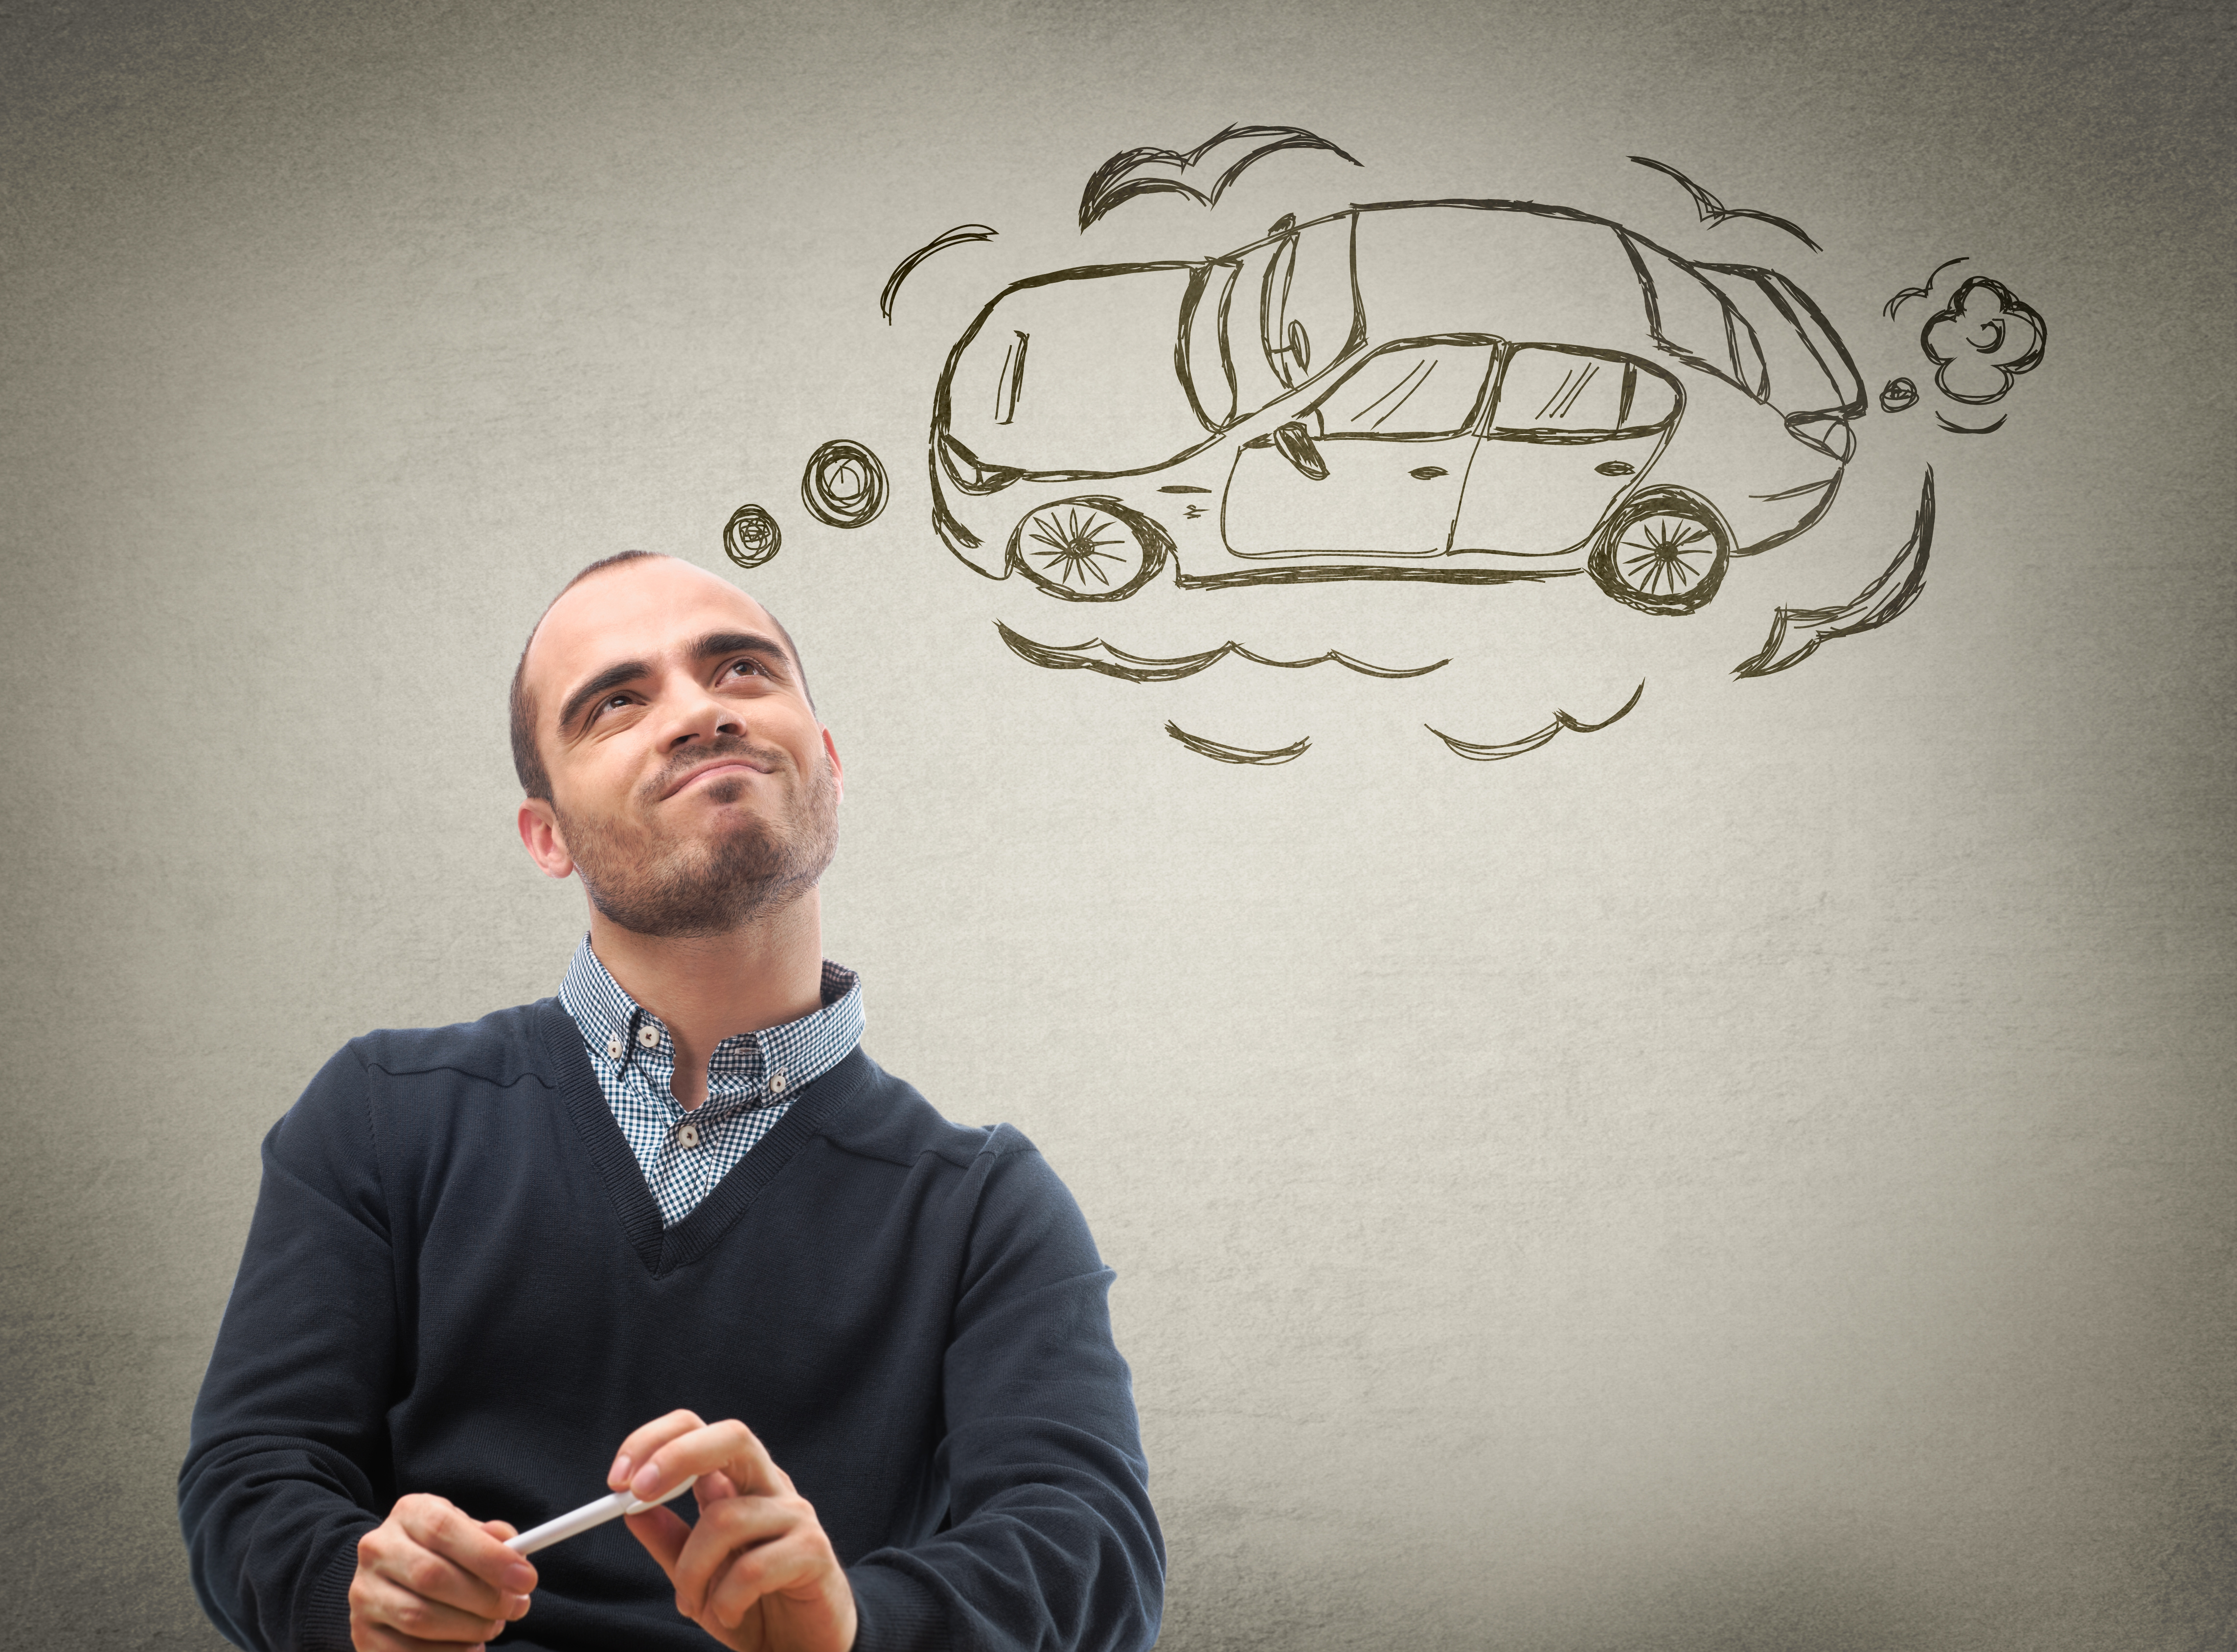 Кредит за кола - особености, условия и характеристики